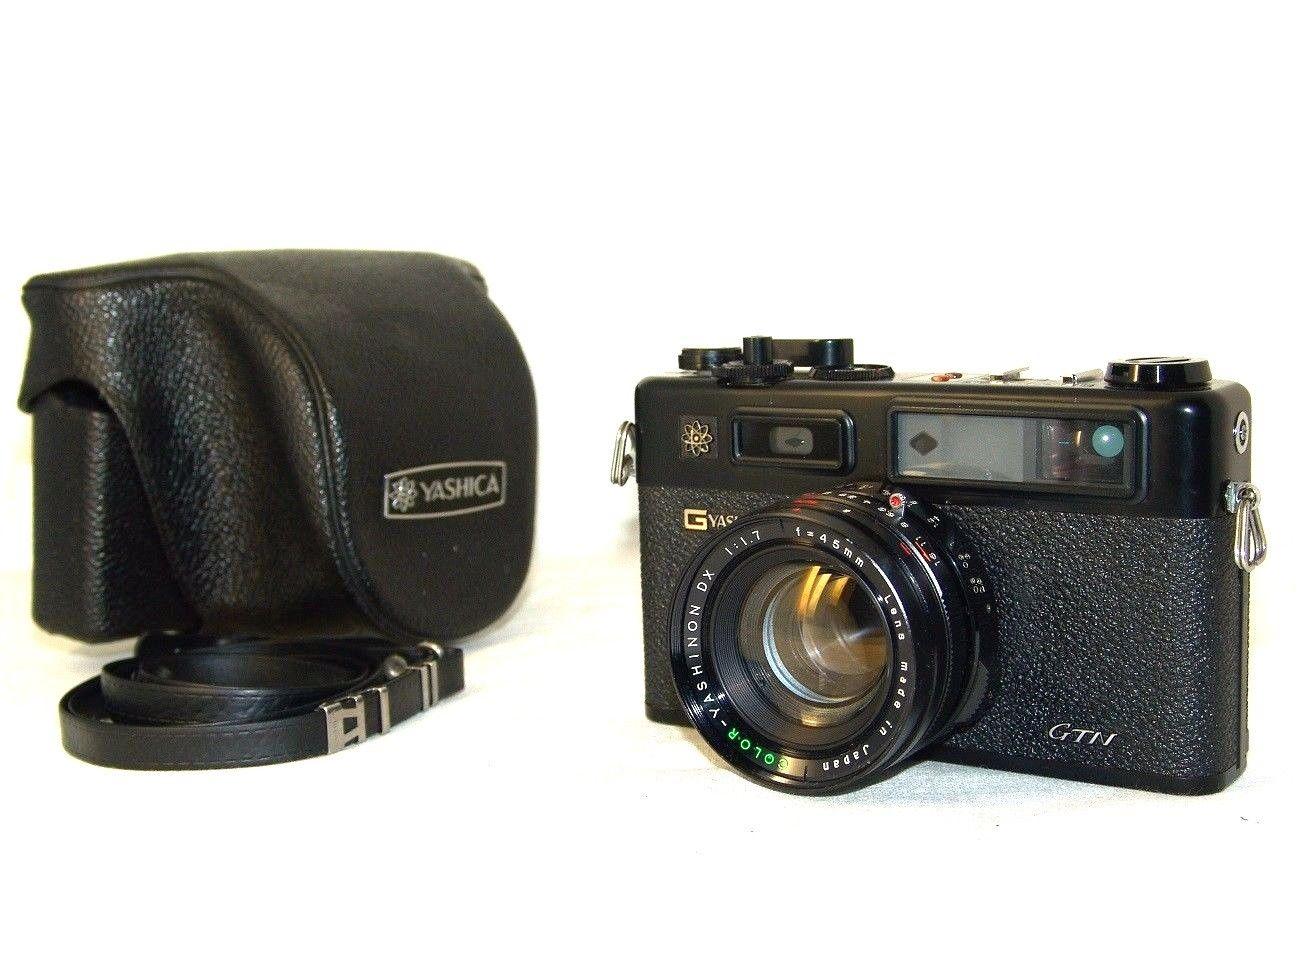 Camera DASHICA GTN electroplating 35 color Yashinon DX 1 7 45mm lens Japan